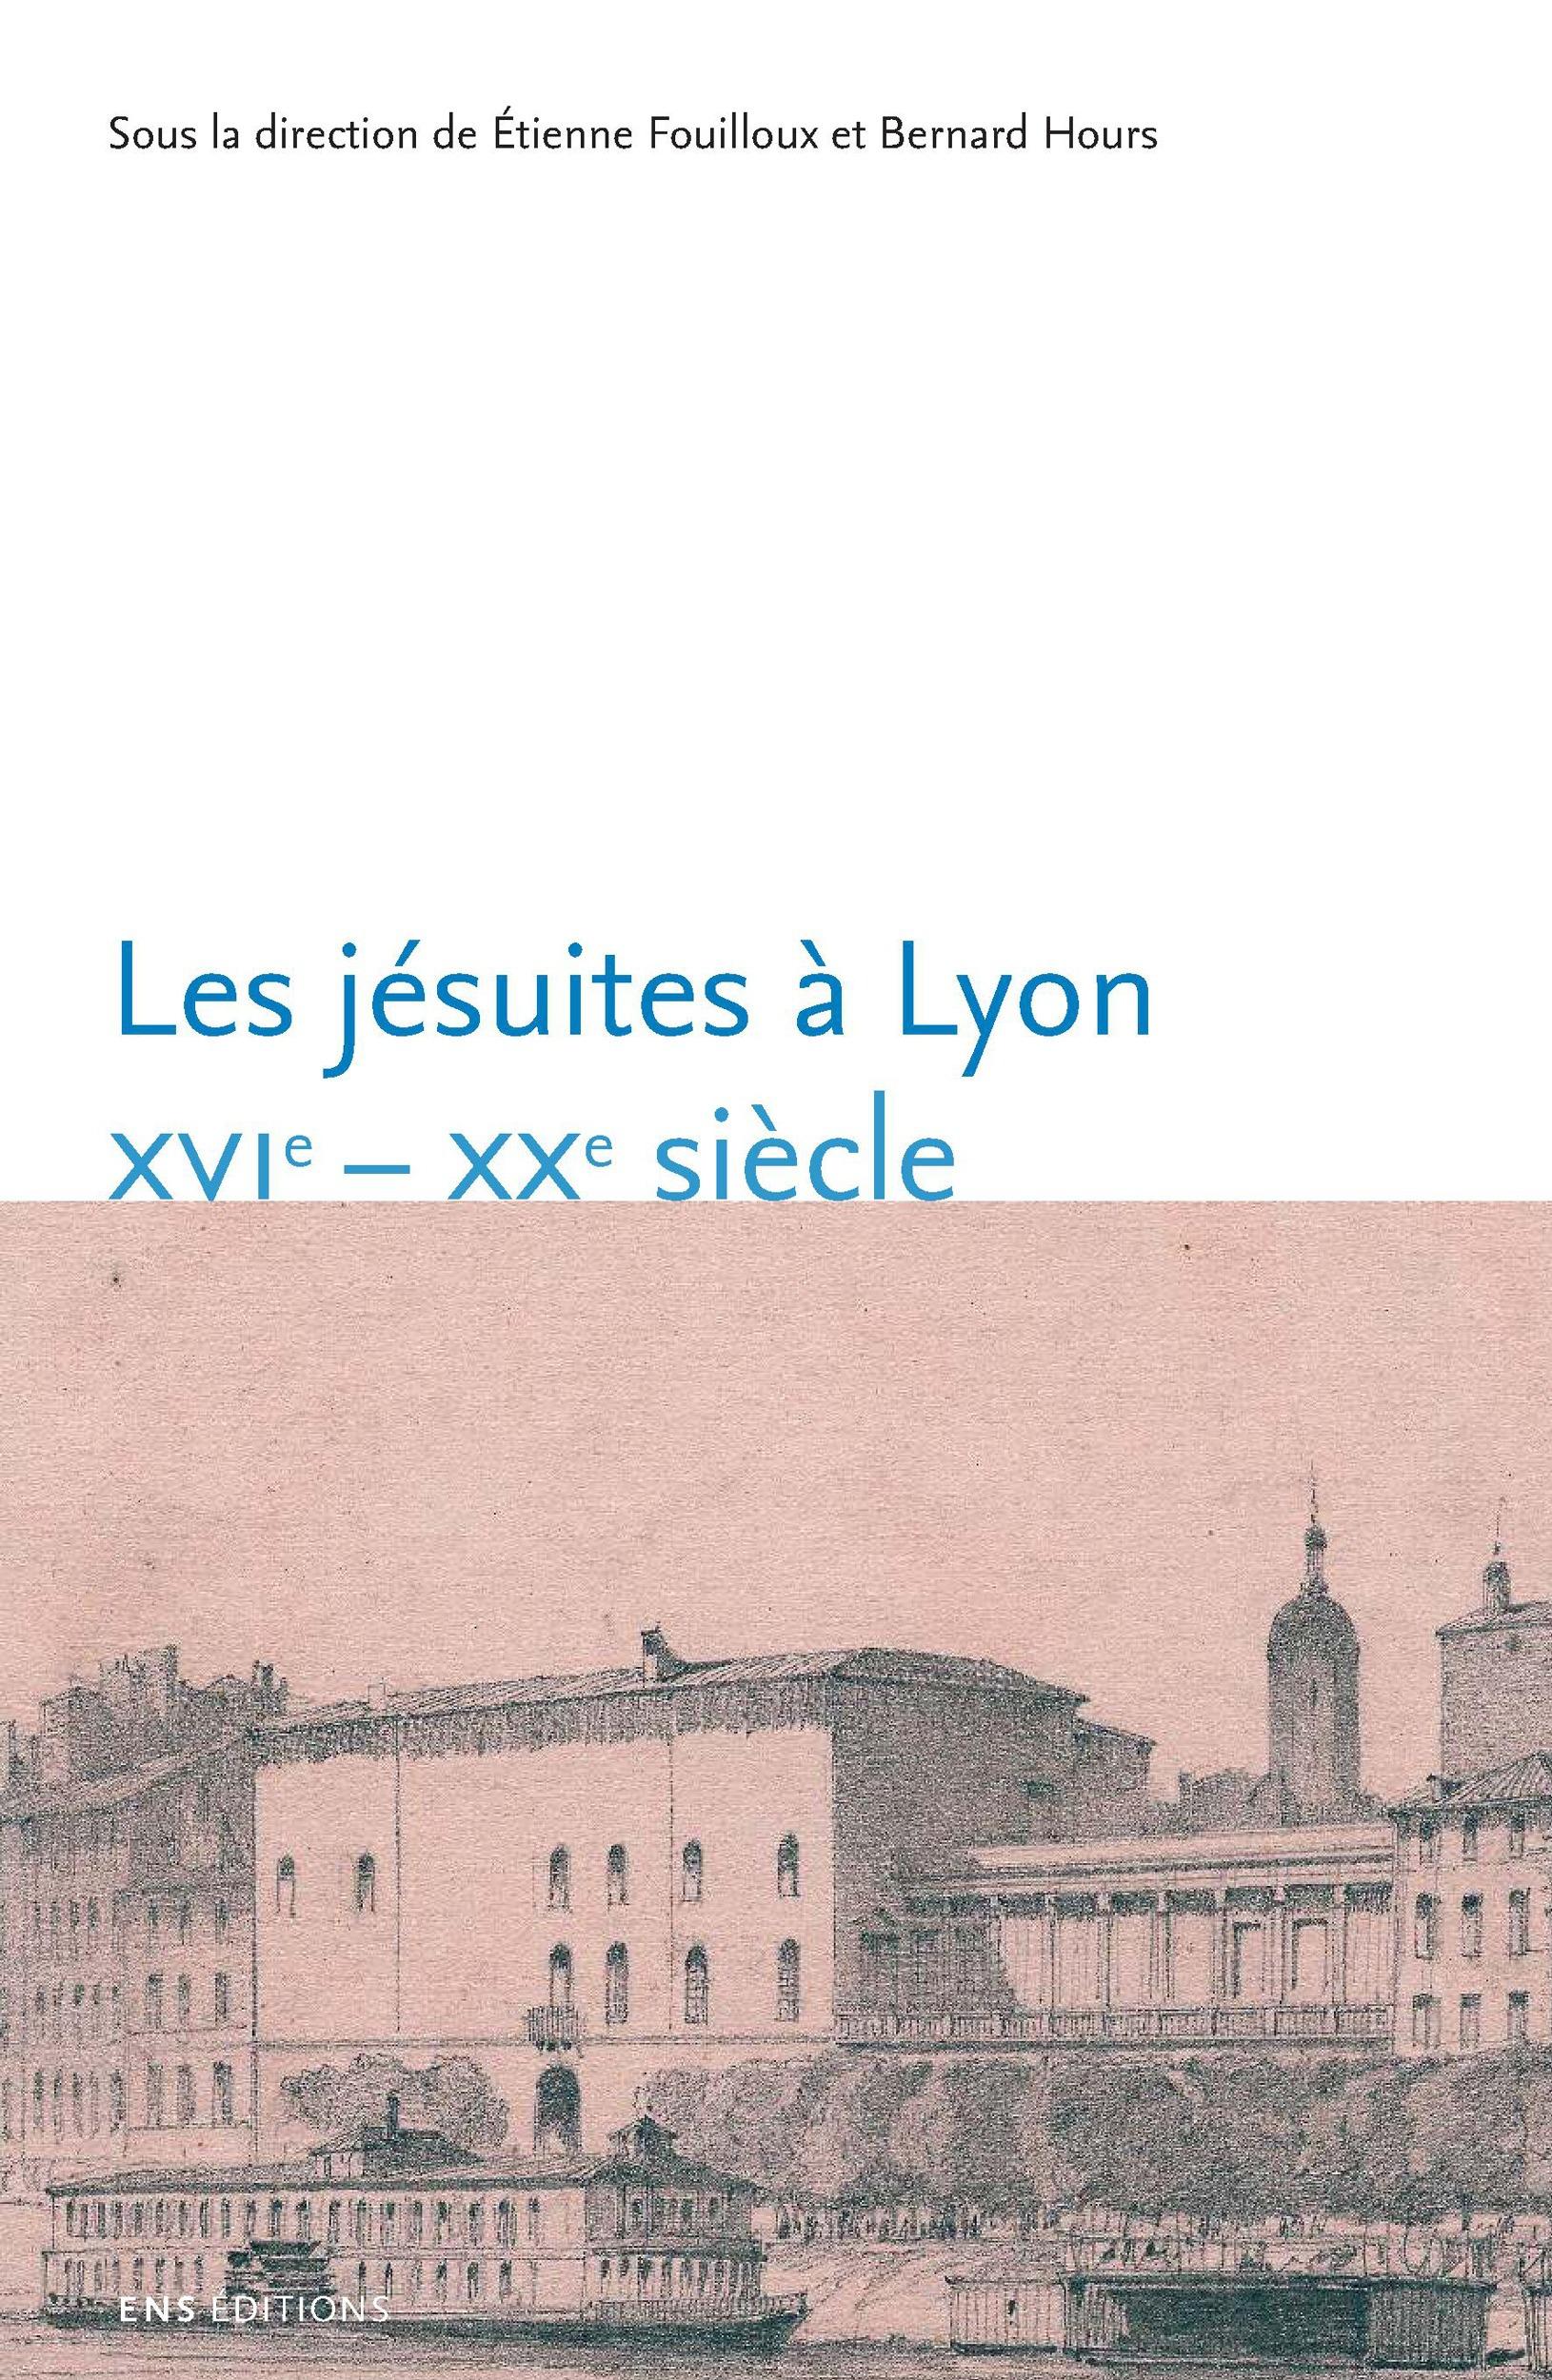 Les jesuites a lyon. 16<sup>e</sup> - 20<sup>e</sup> siecle